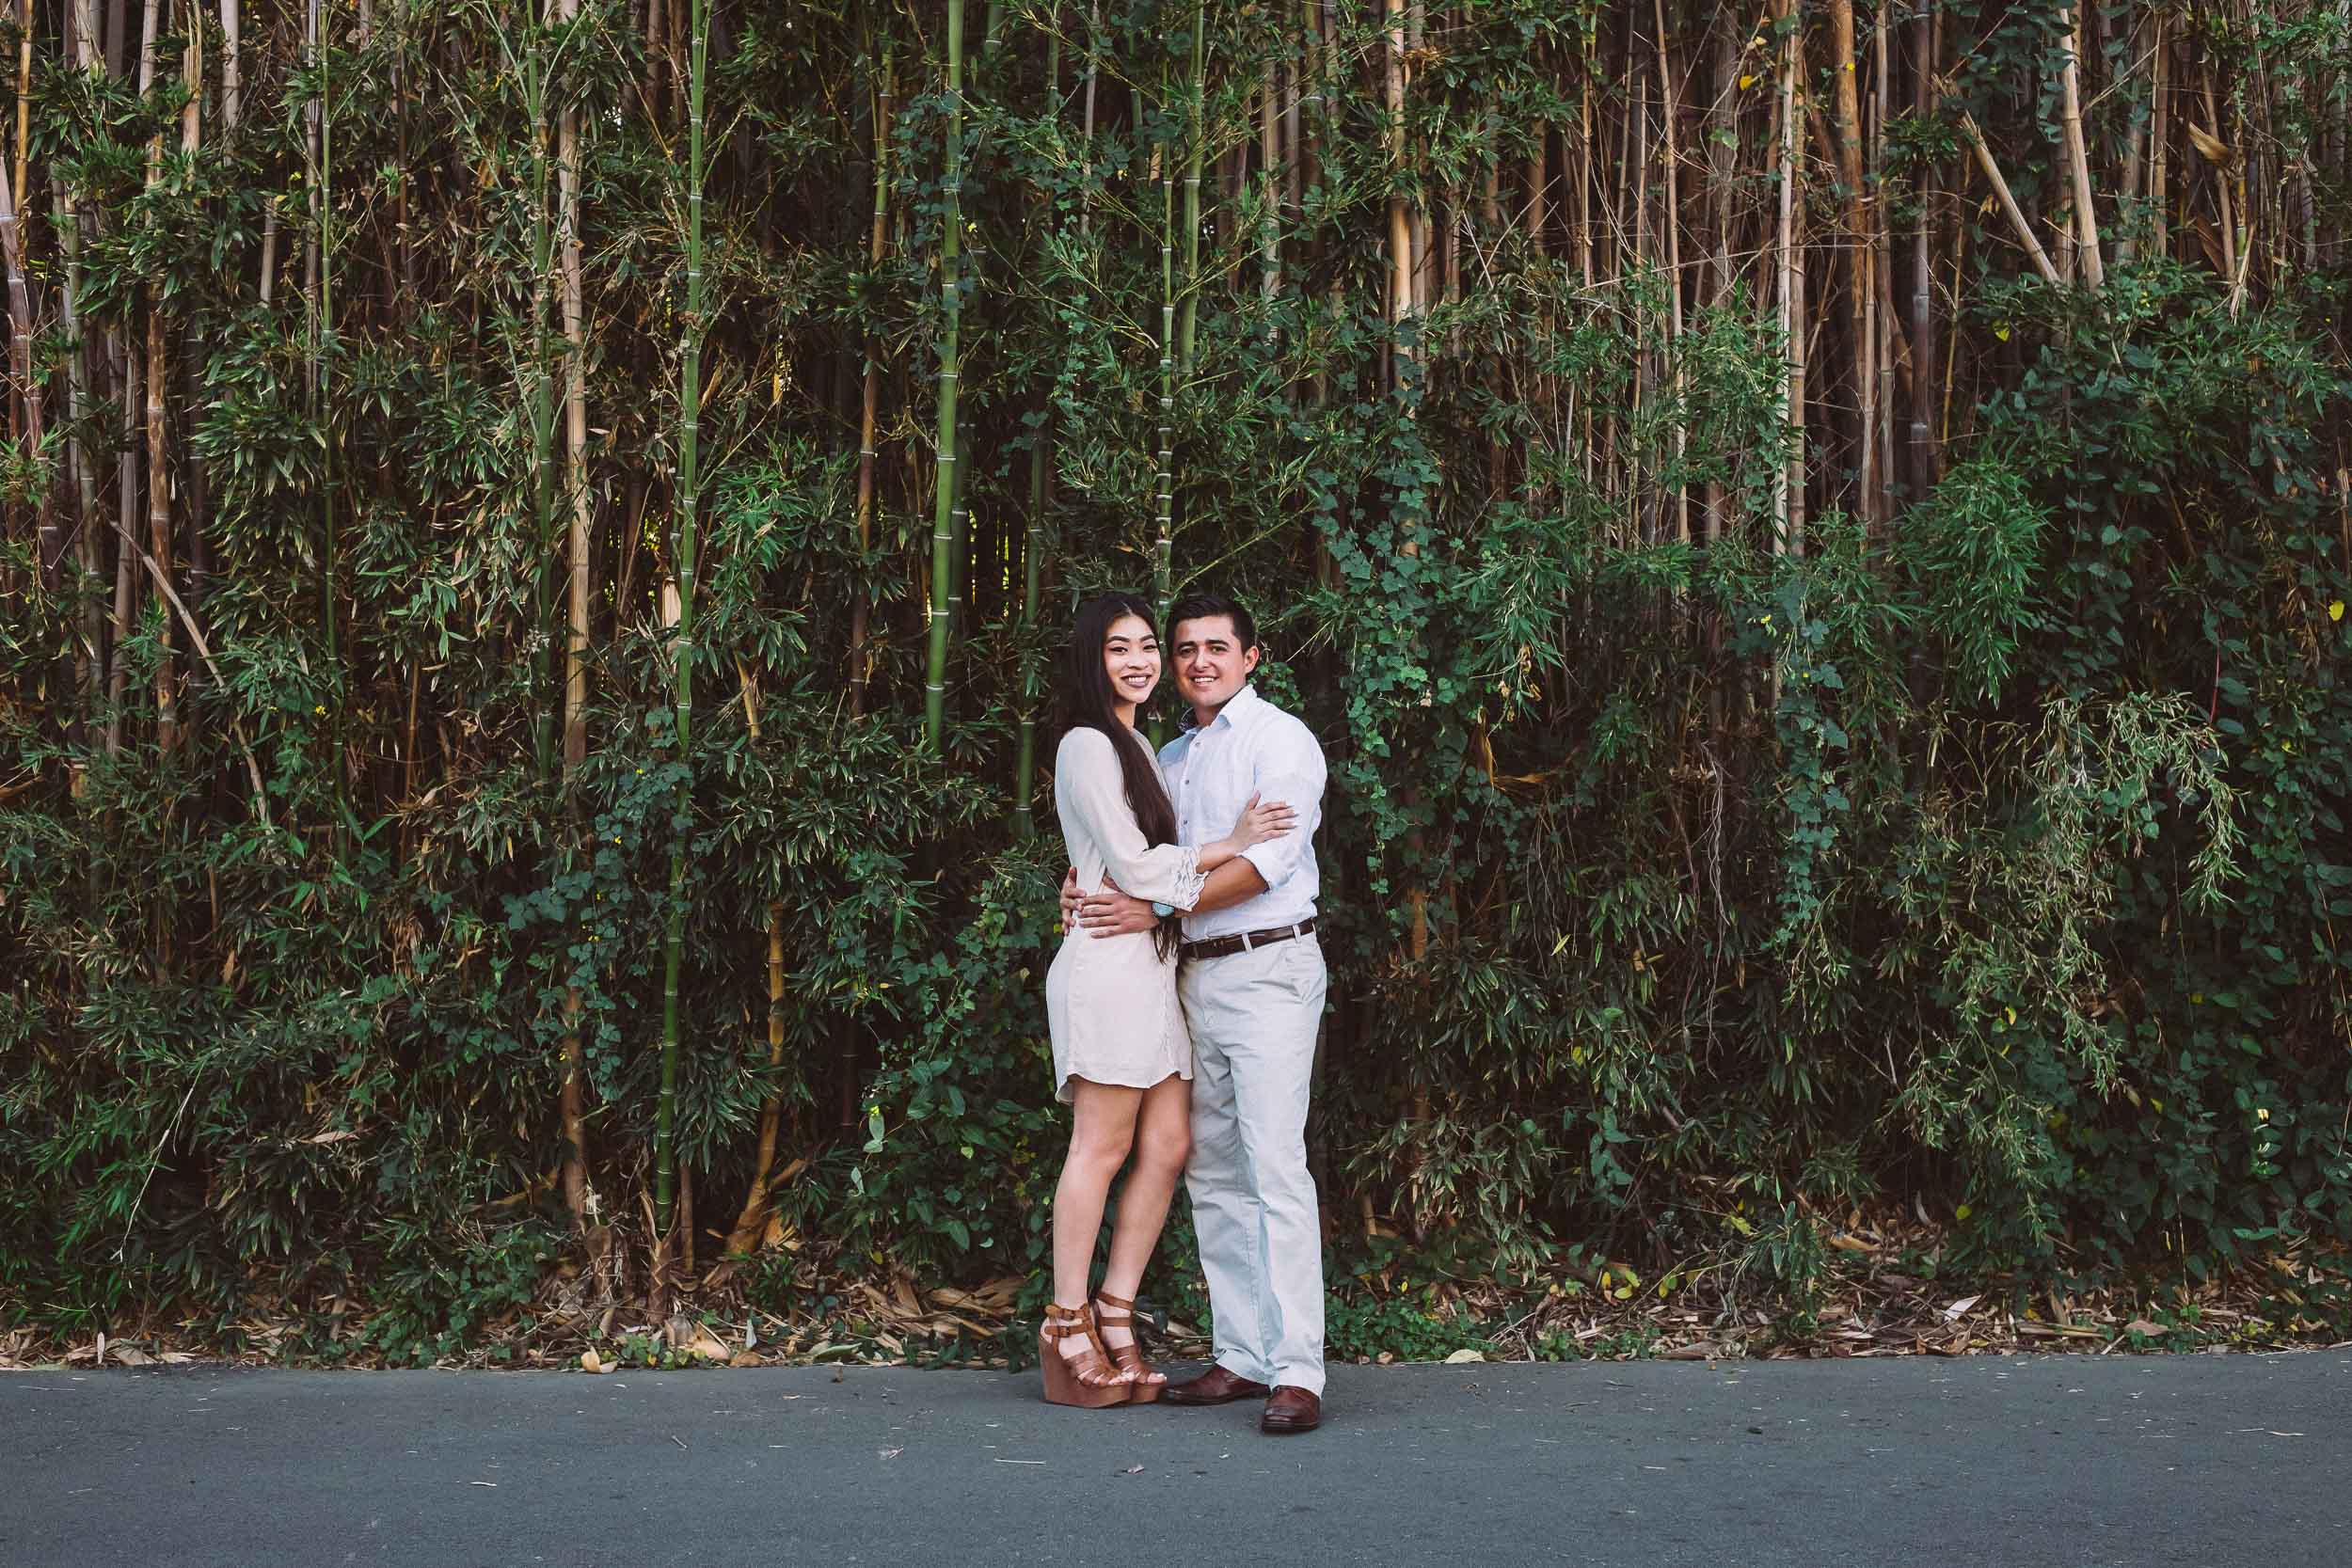 Bryan-Miraflor-Photography-Suzie-Victor-Engagement-Los-Angeles-Arboretum-20151121-0052.jpg